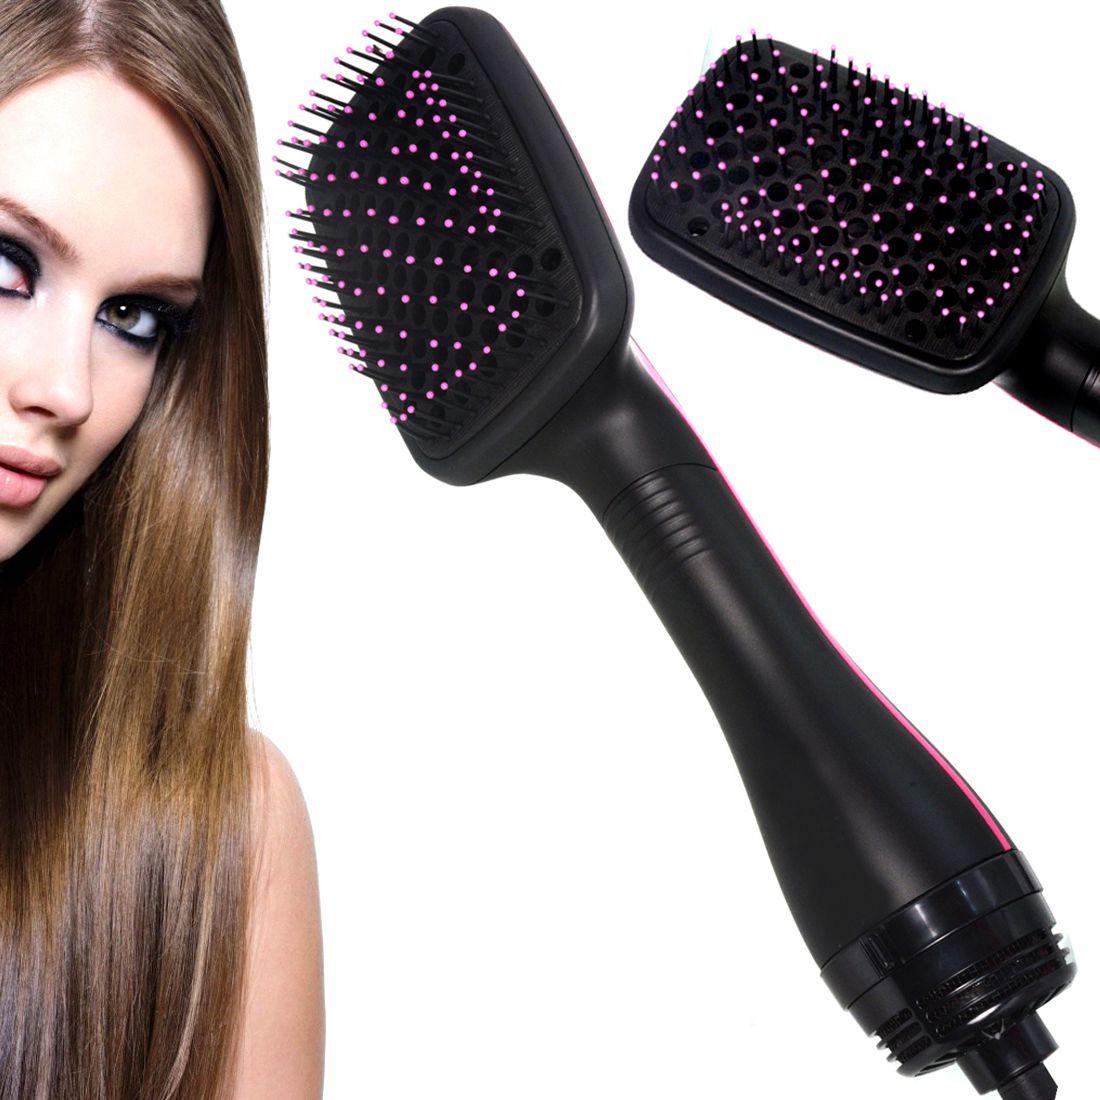 Jm 2 in 1 Flat Iron Professional Travel Hair Straighteners 45W Hair Straightener ( Black )